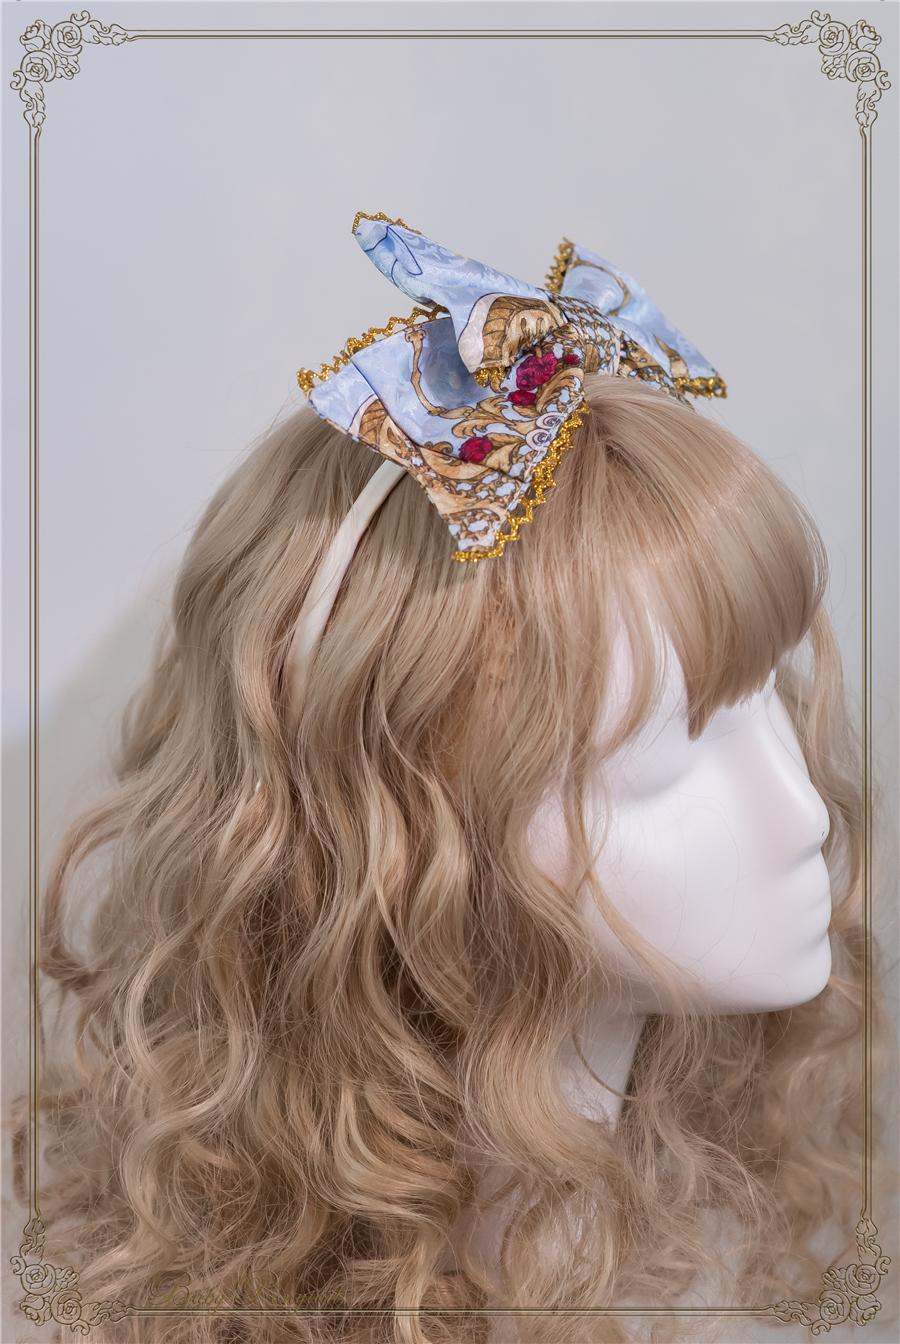 Baby Ponytail_Stock photo_Circus Princess_KC Sax_04.jpg